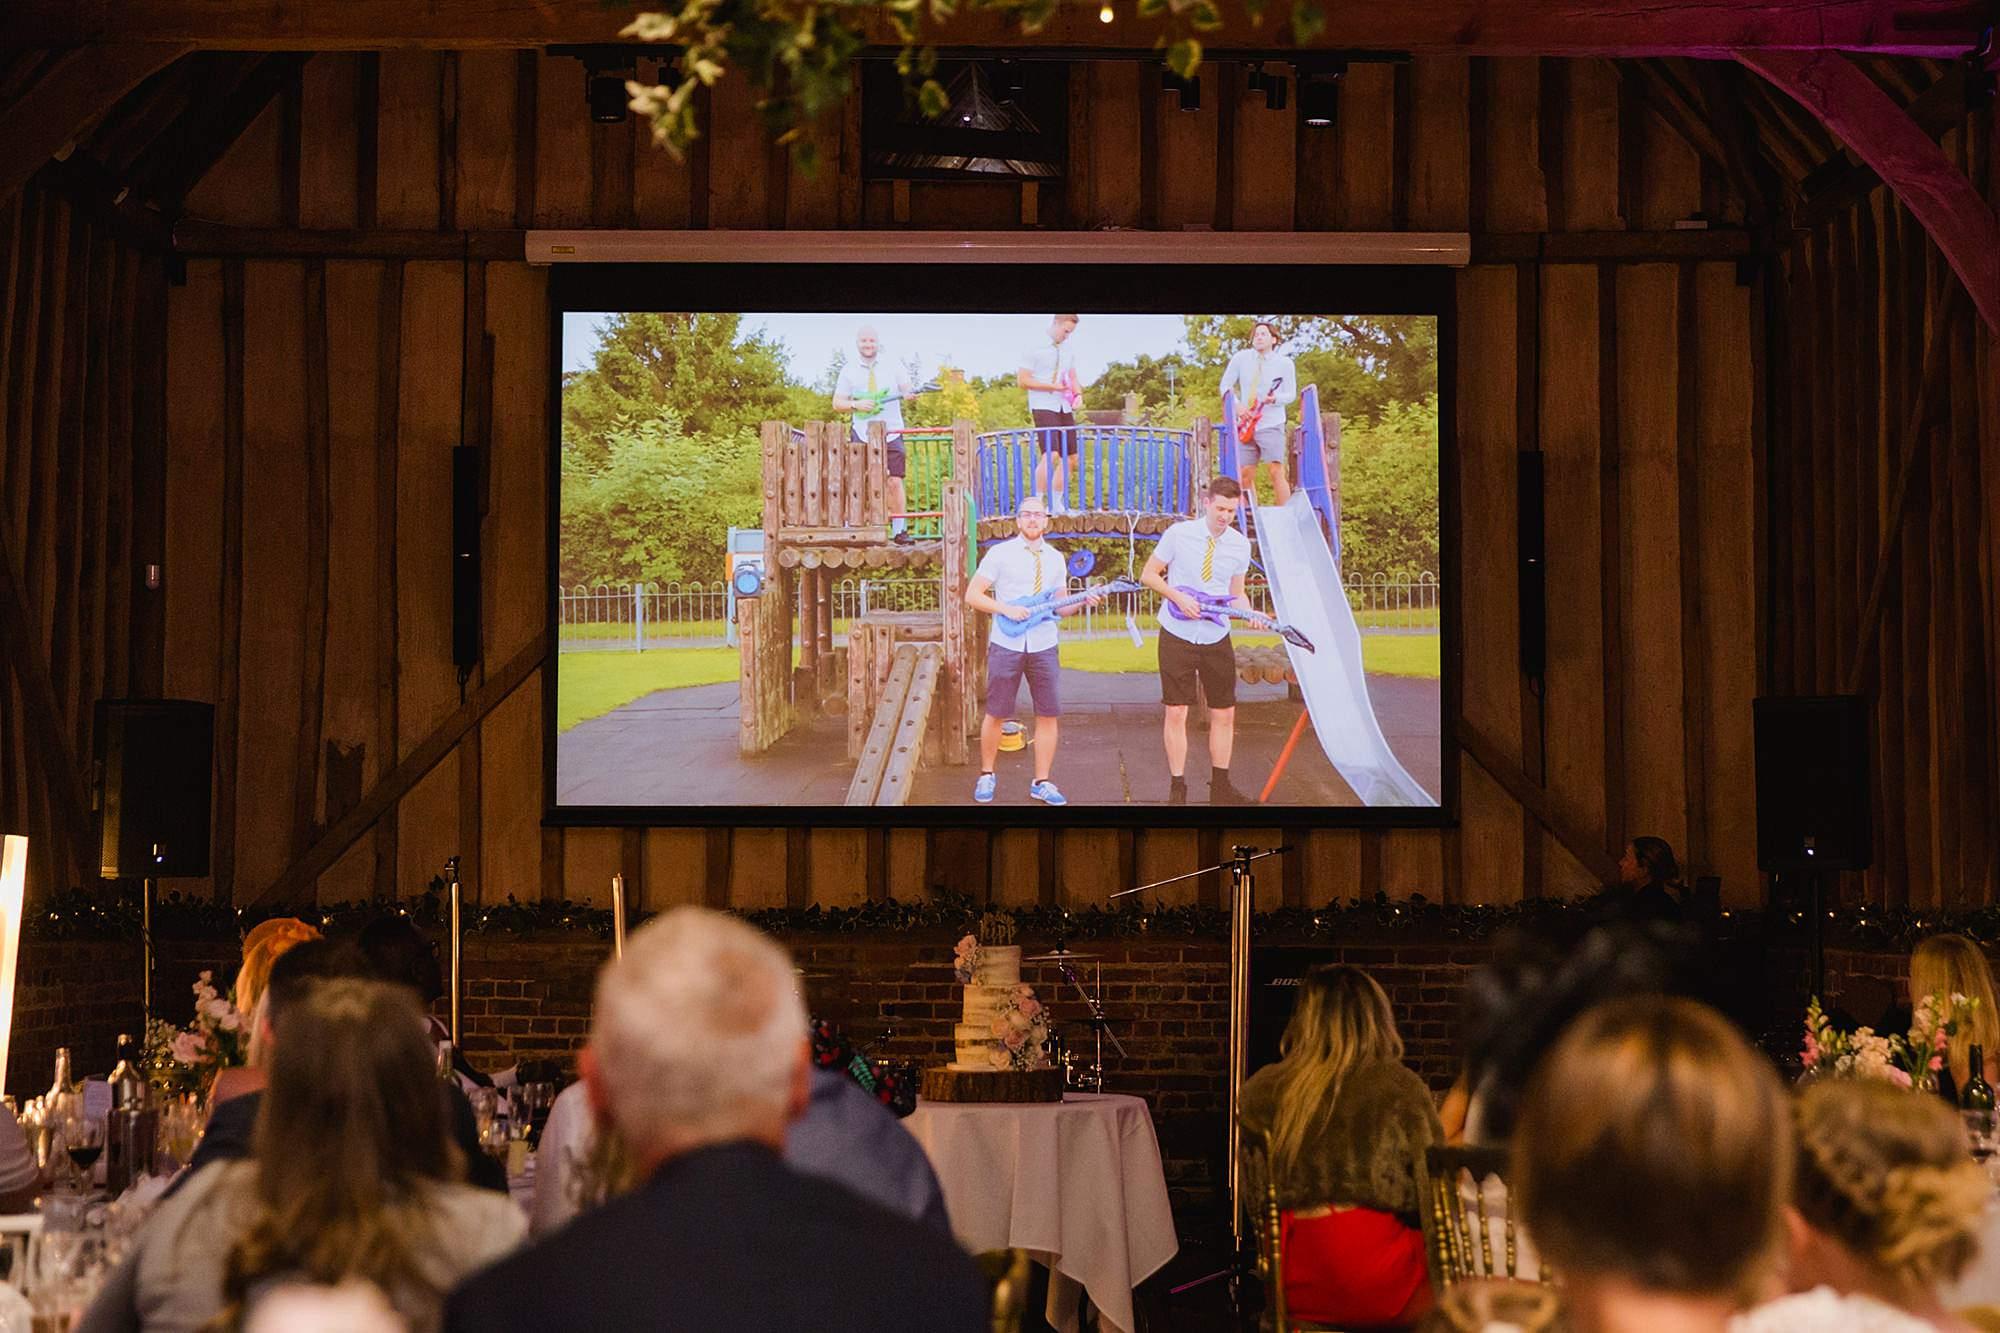 Lillibrooke Manor wedding best man's boyband themed speech